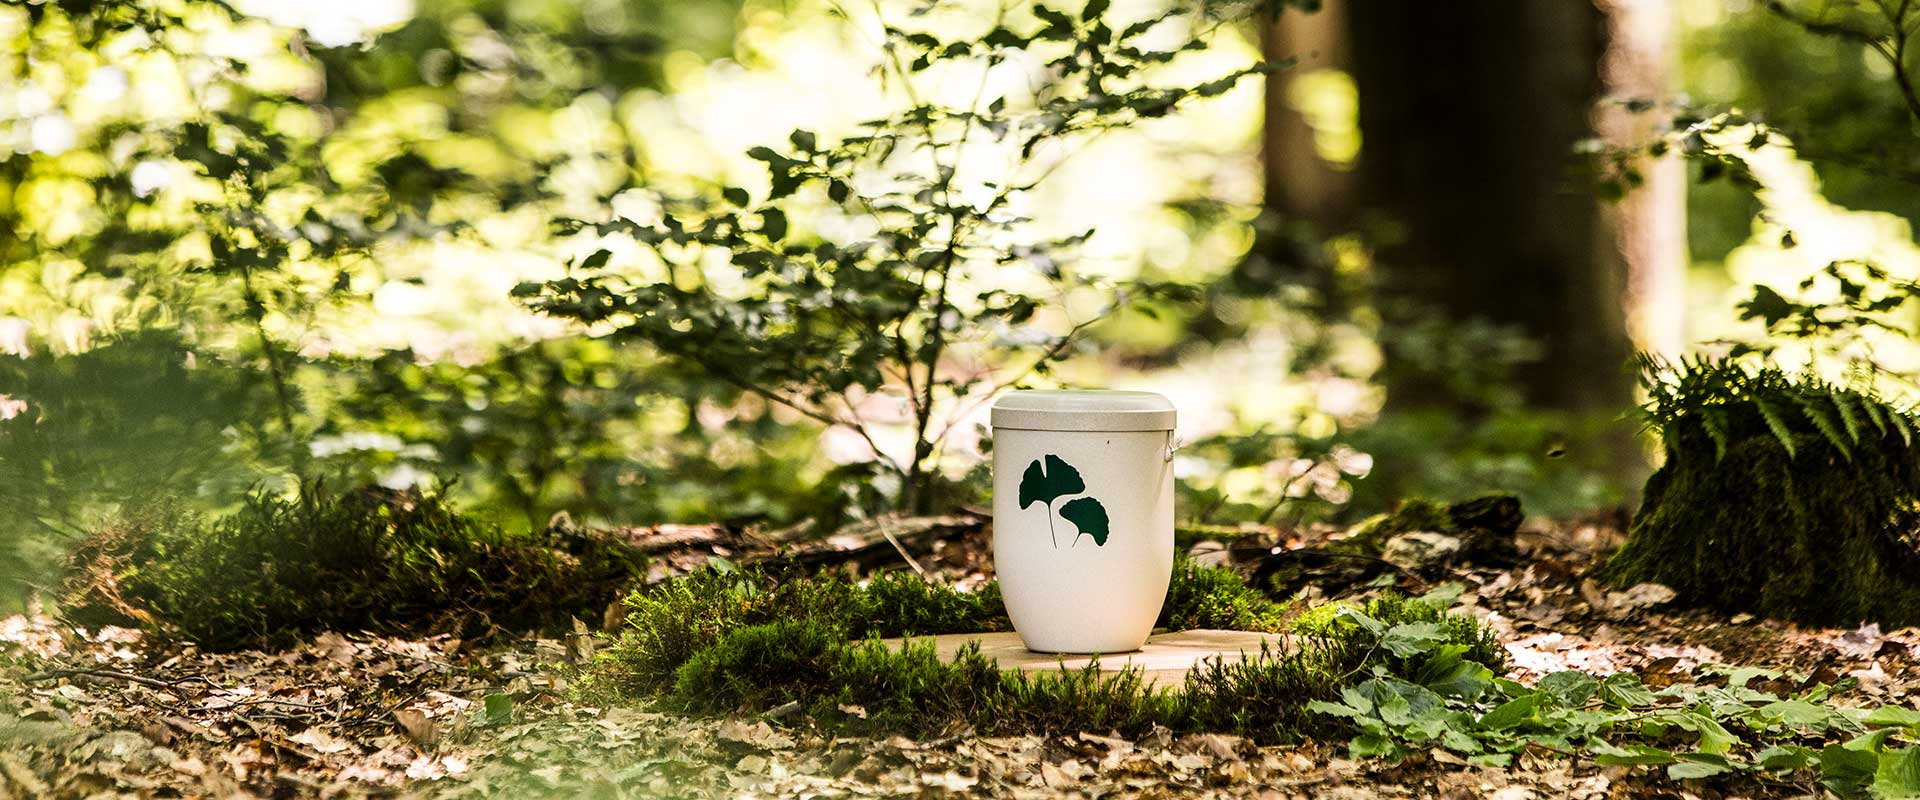 Wald-Naturbestattung